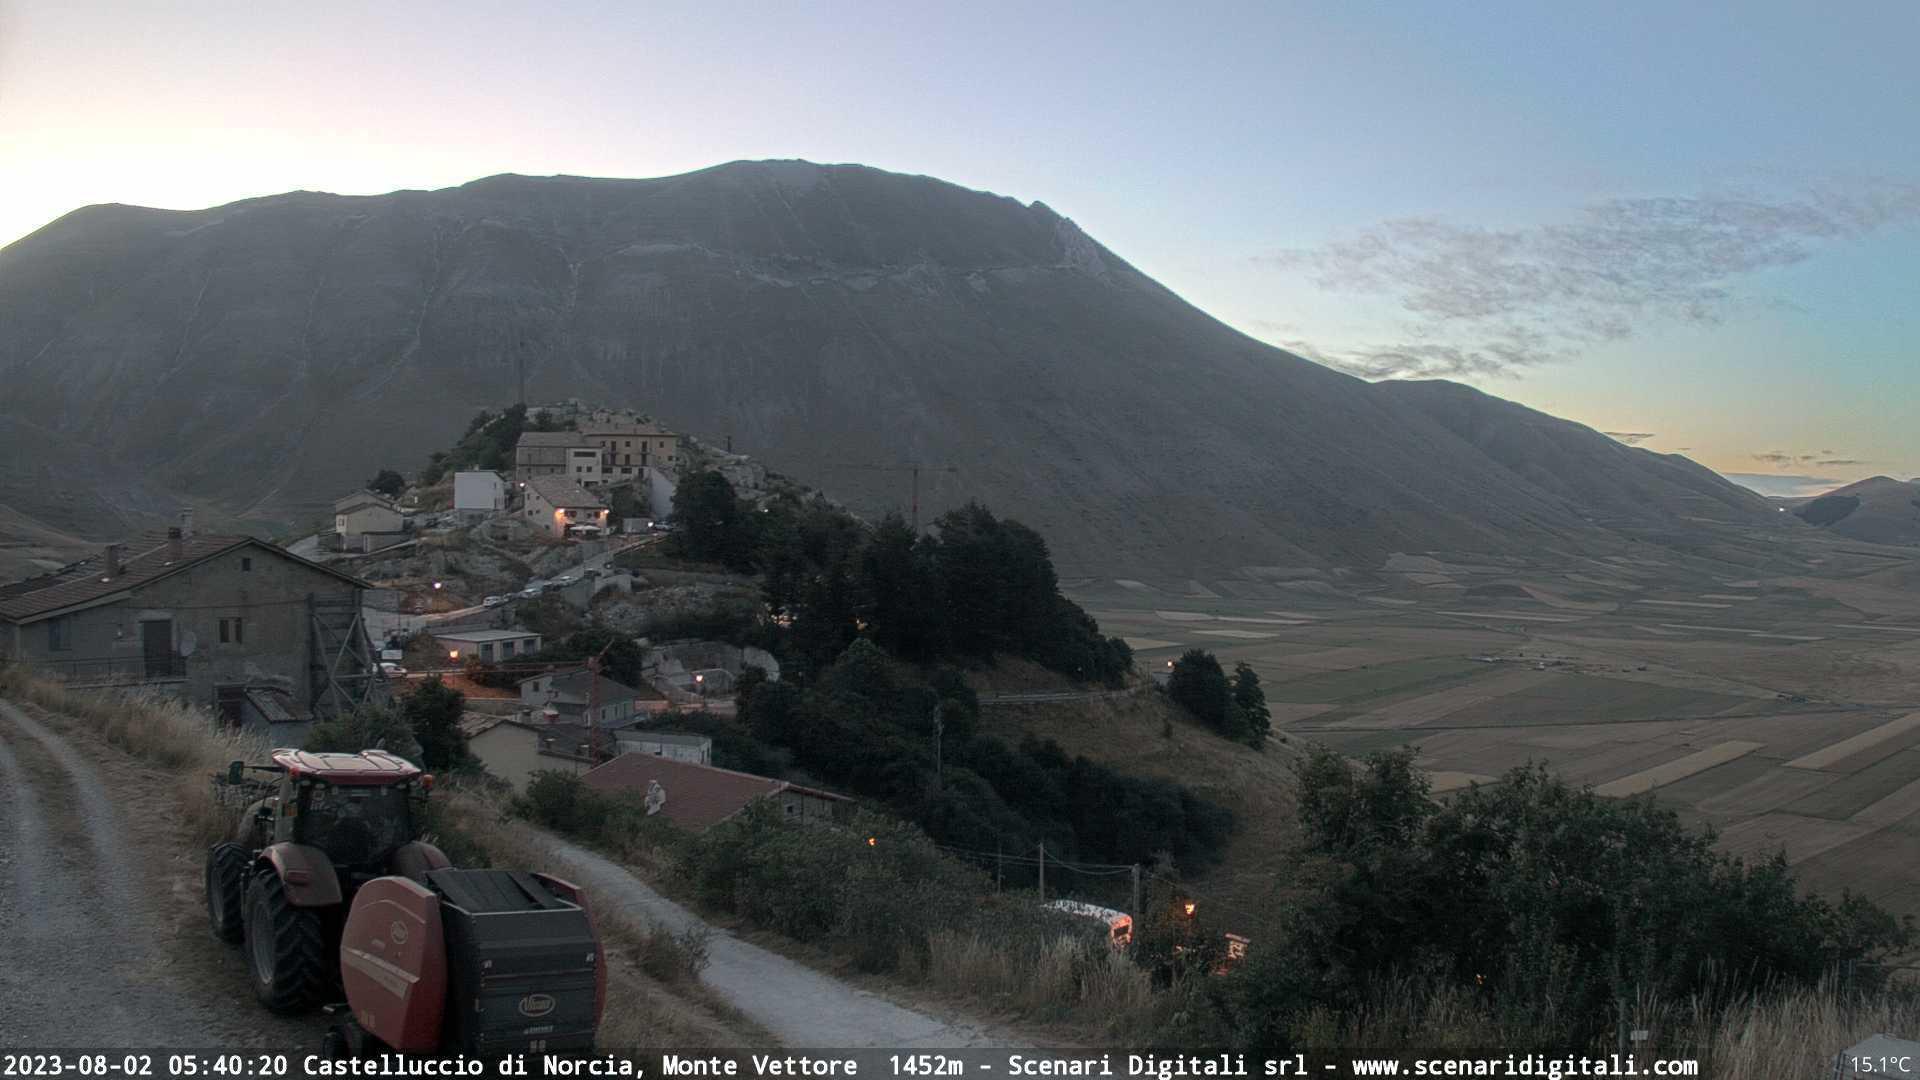 Webcam Castelluccio: Monte Vettore